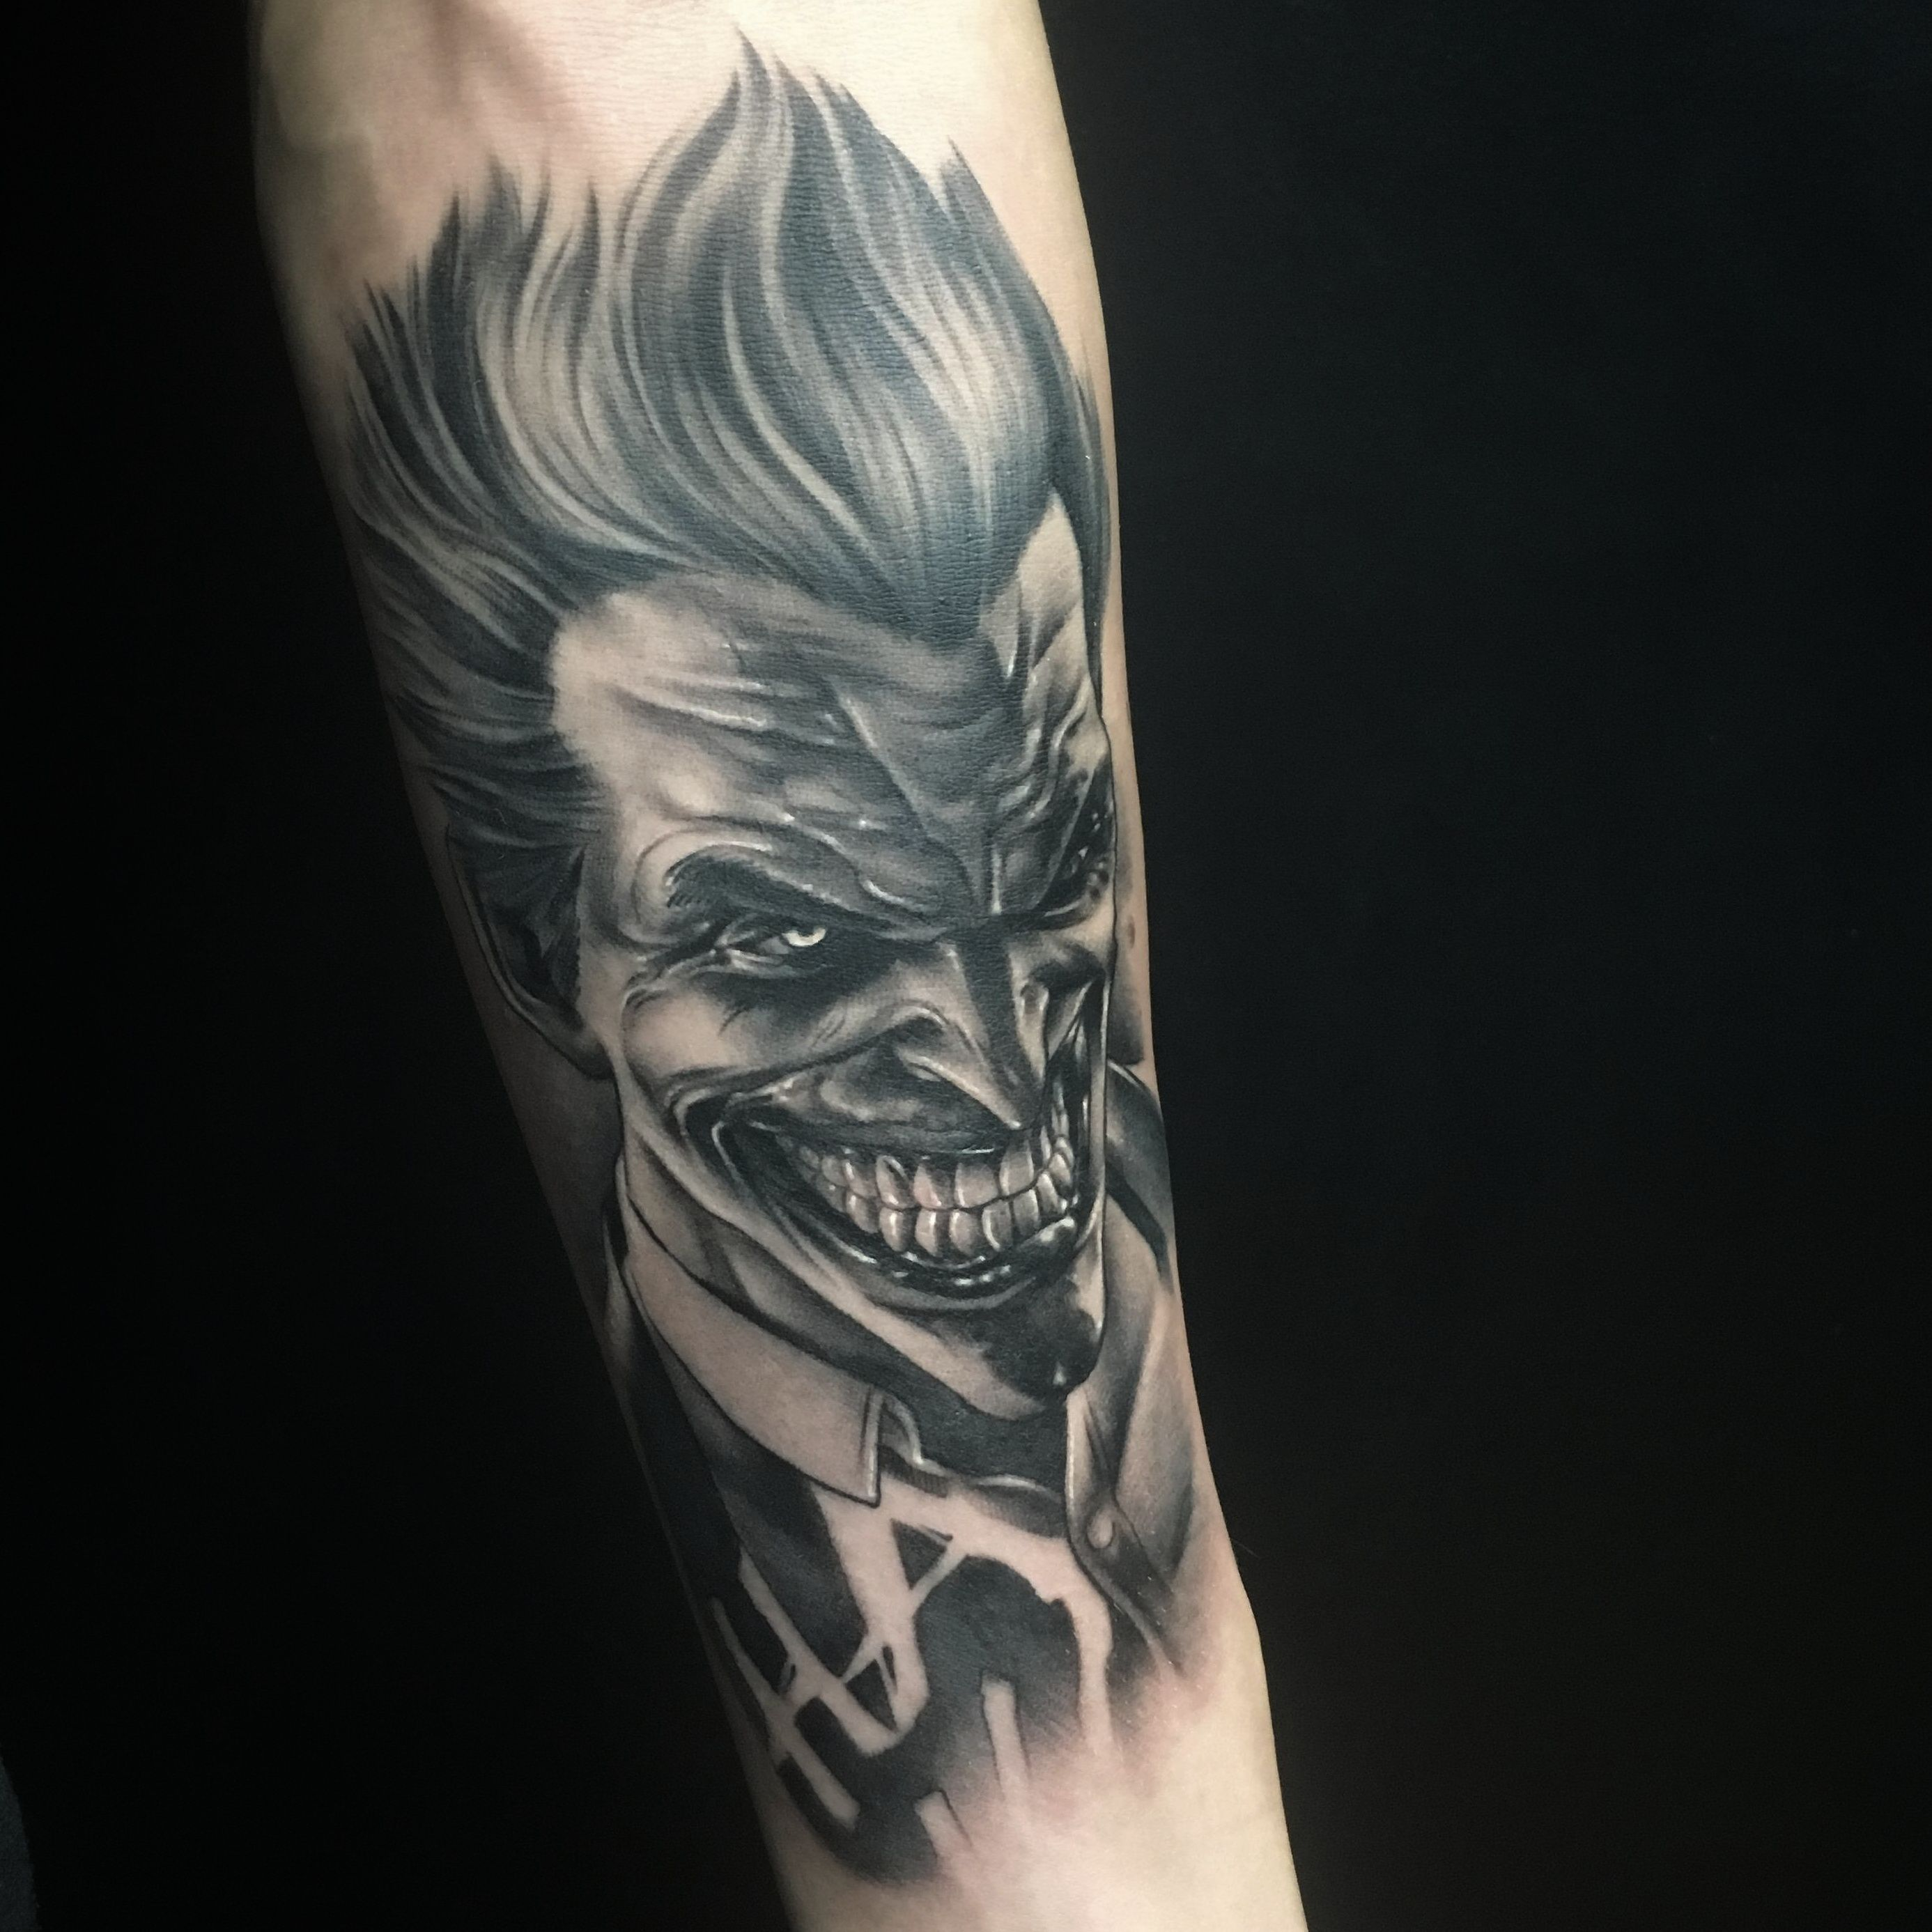 Joker Tattoo By Pablo Munilla Tattoos Tattoos For Guys